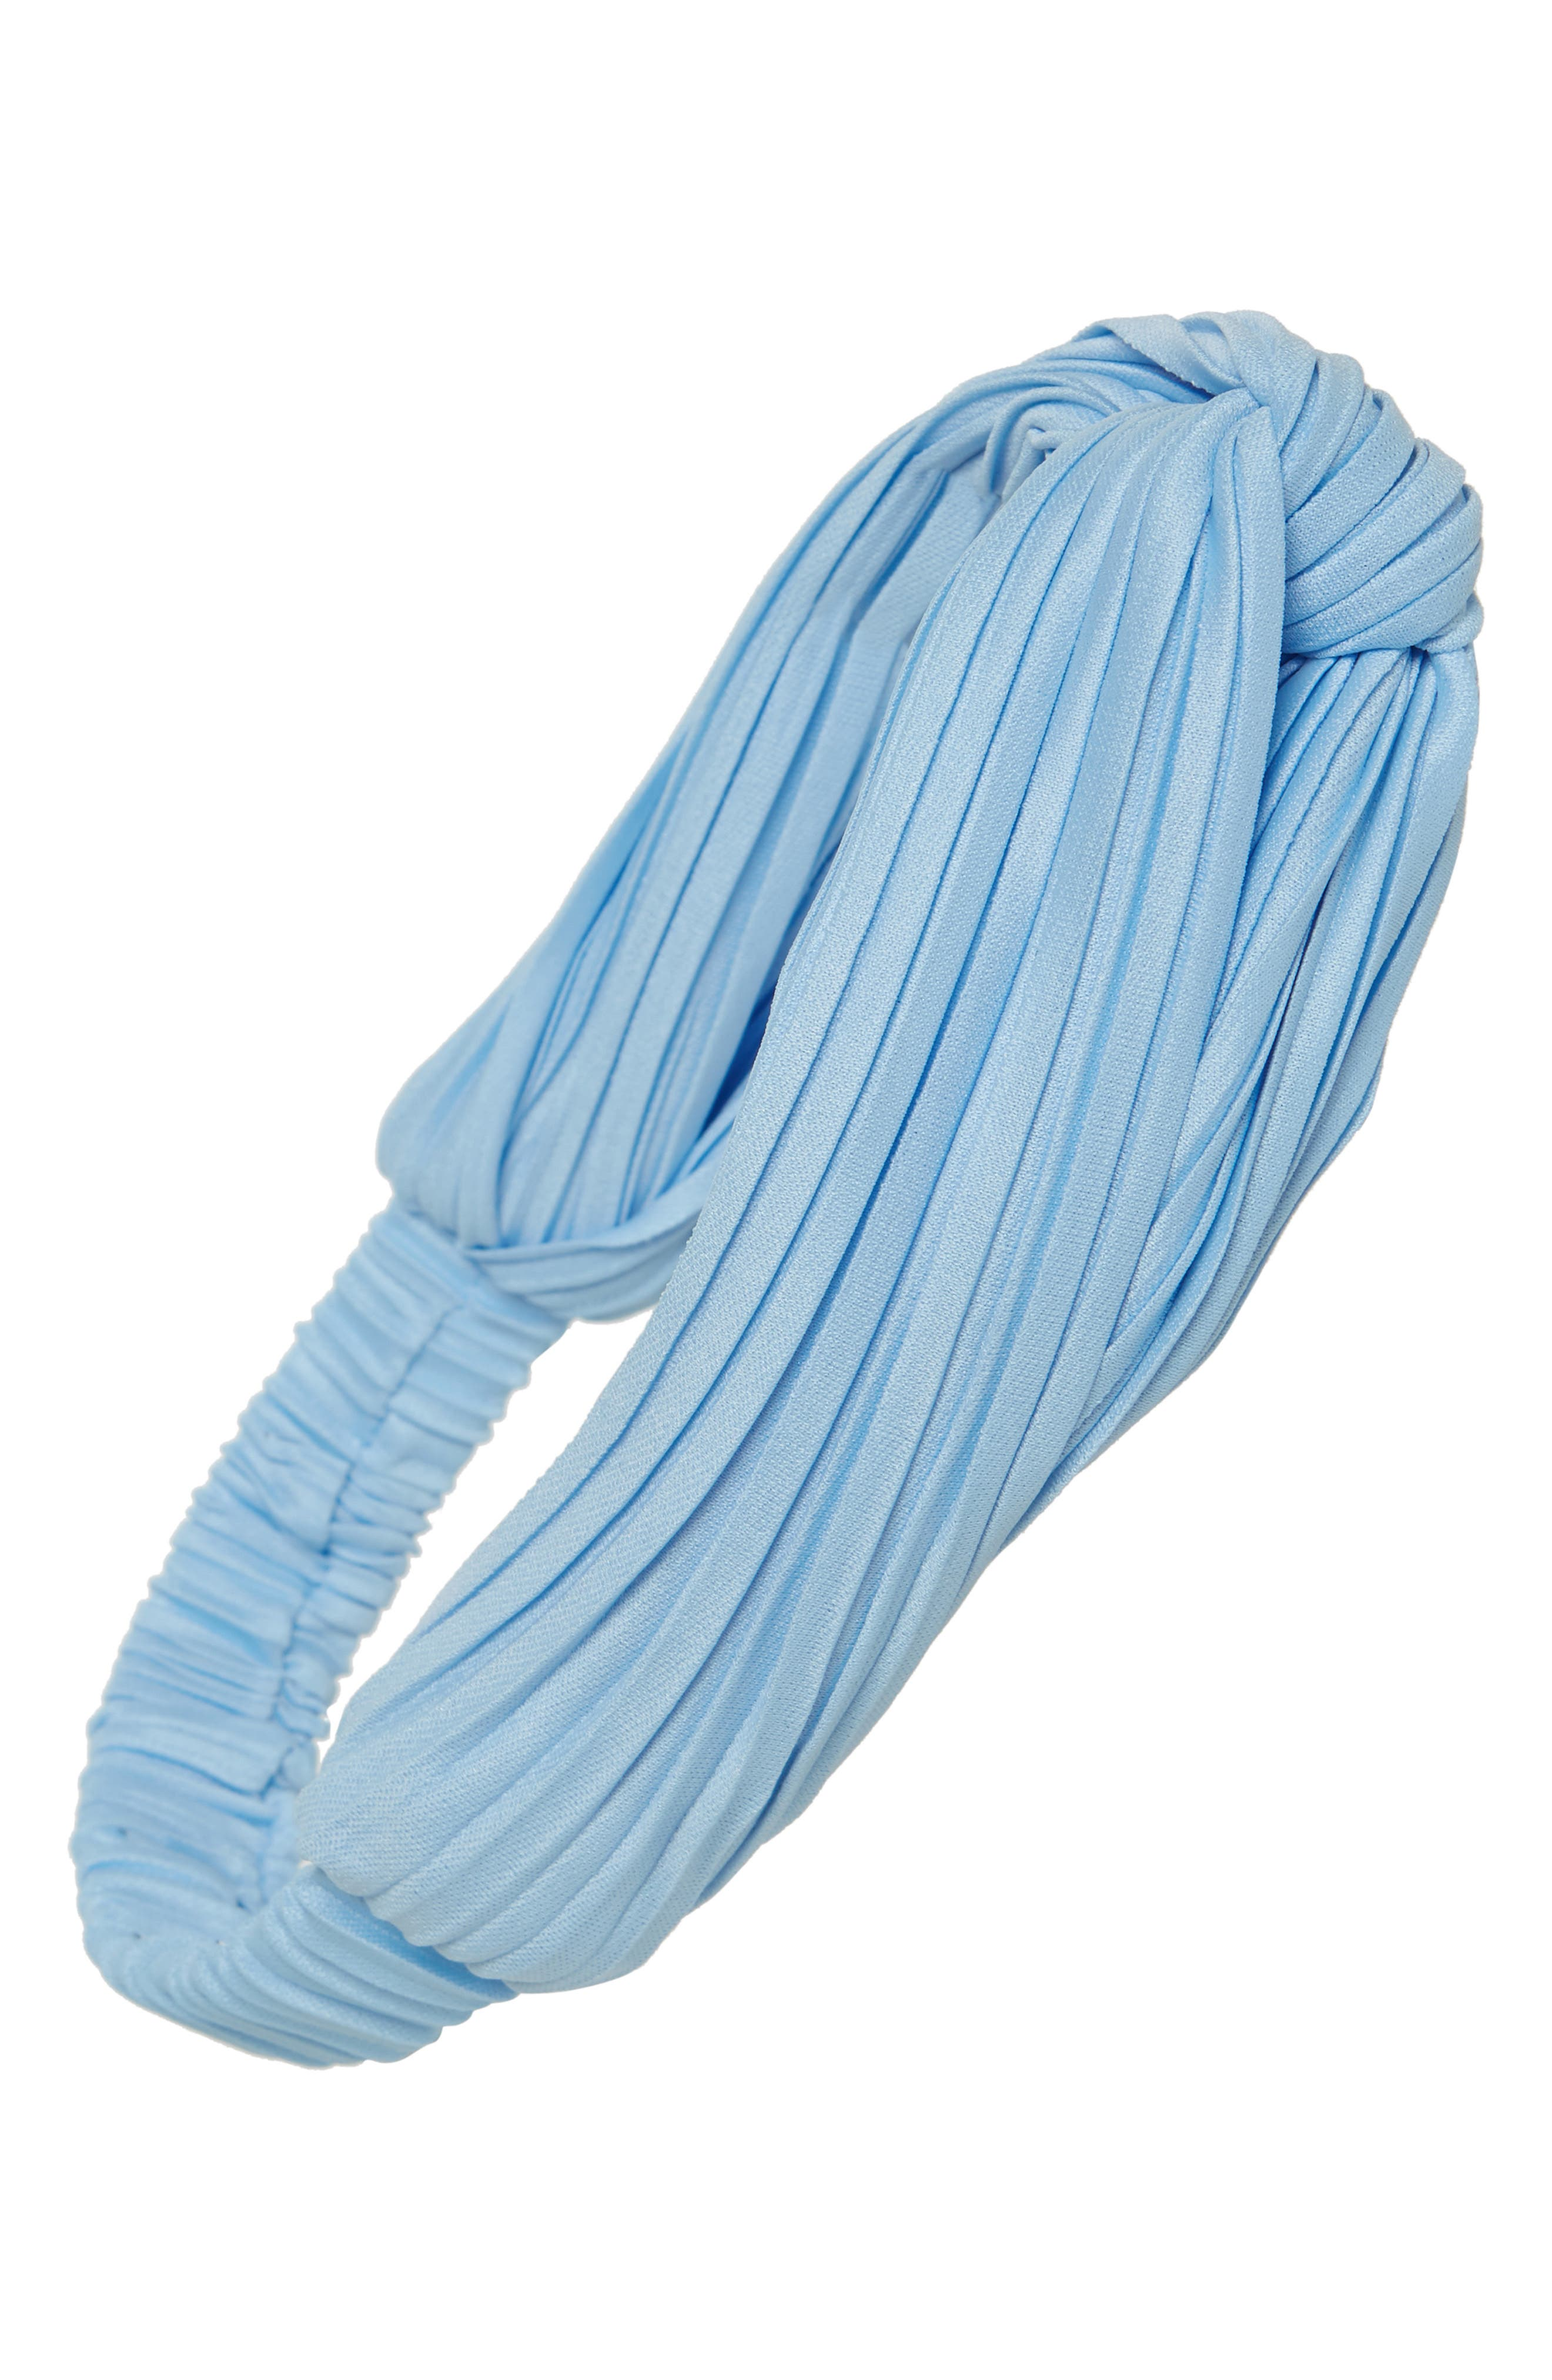 CARA, Pleated Turban Head Wrap, Main thumbnail 1, color, BLUE